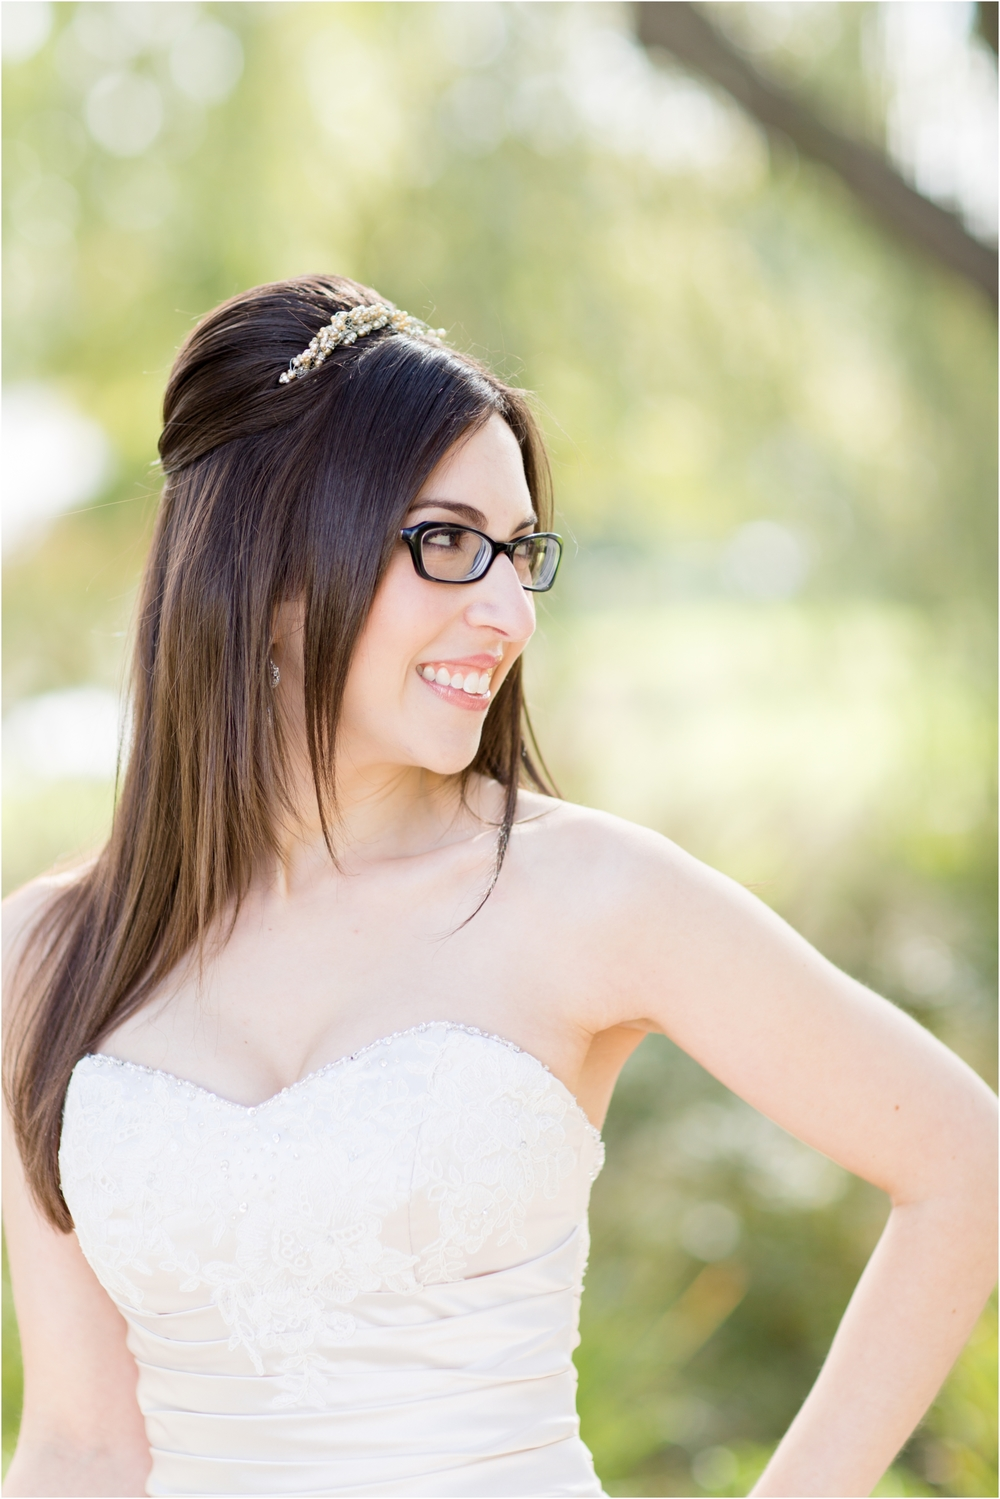 Elhai-Wedding-3-Bride-and-Groom-334.jpg